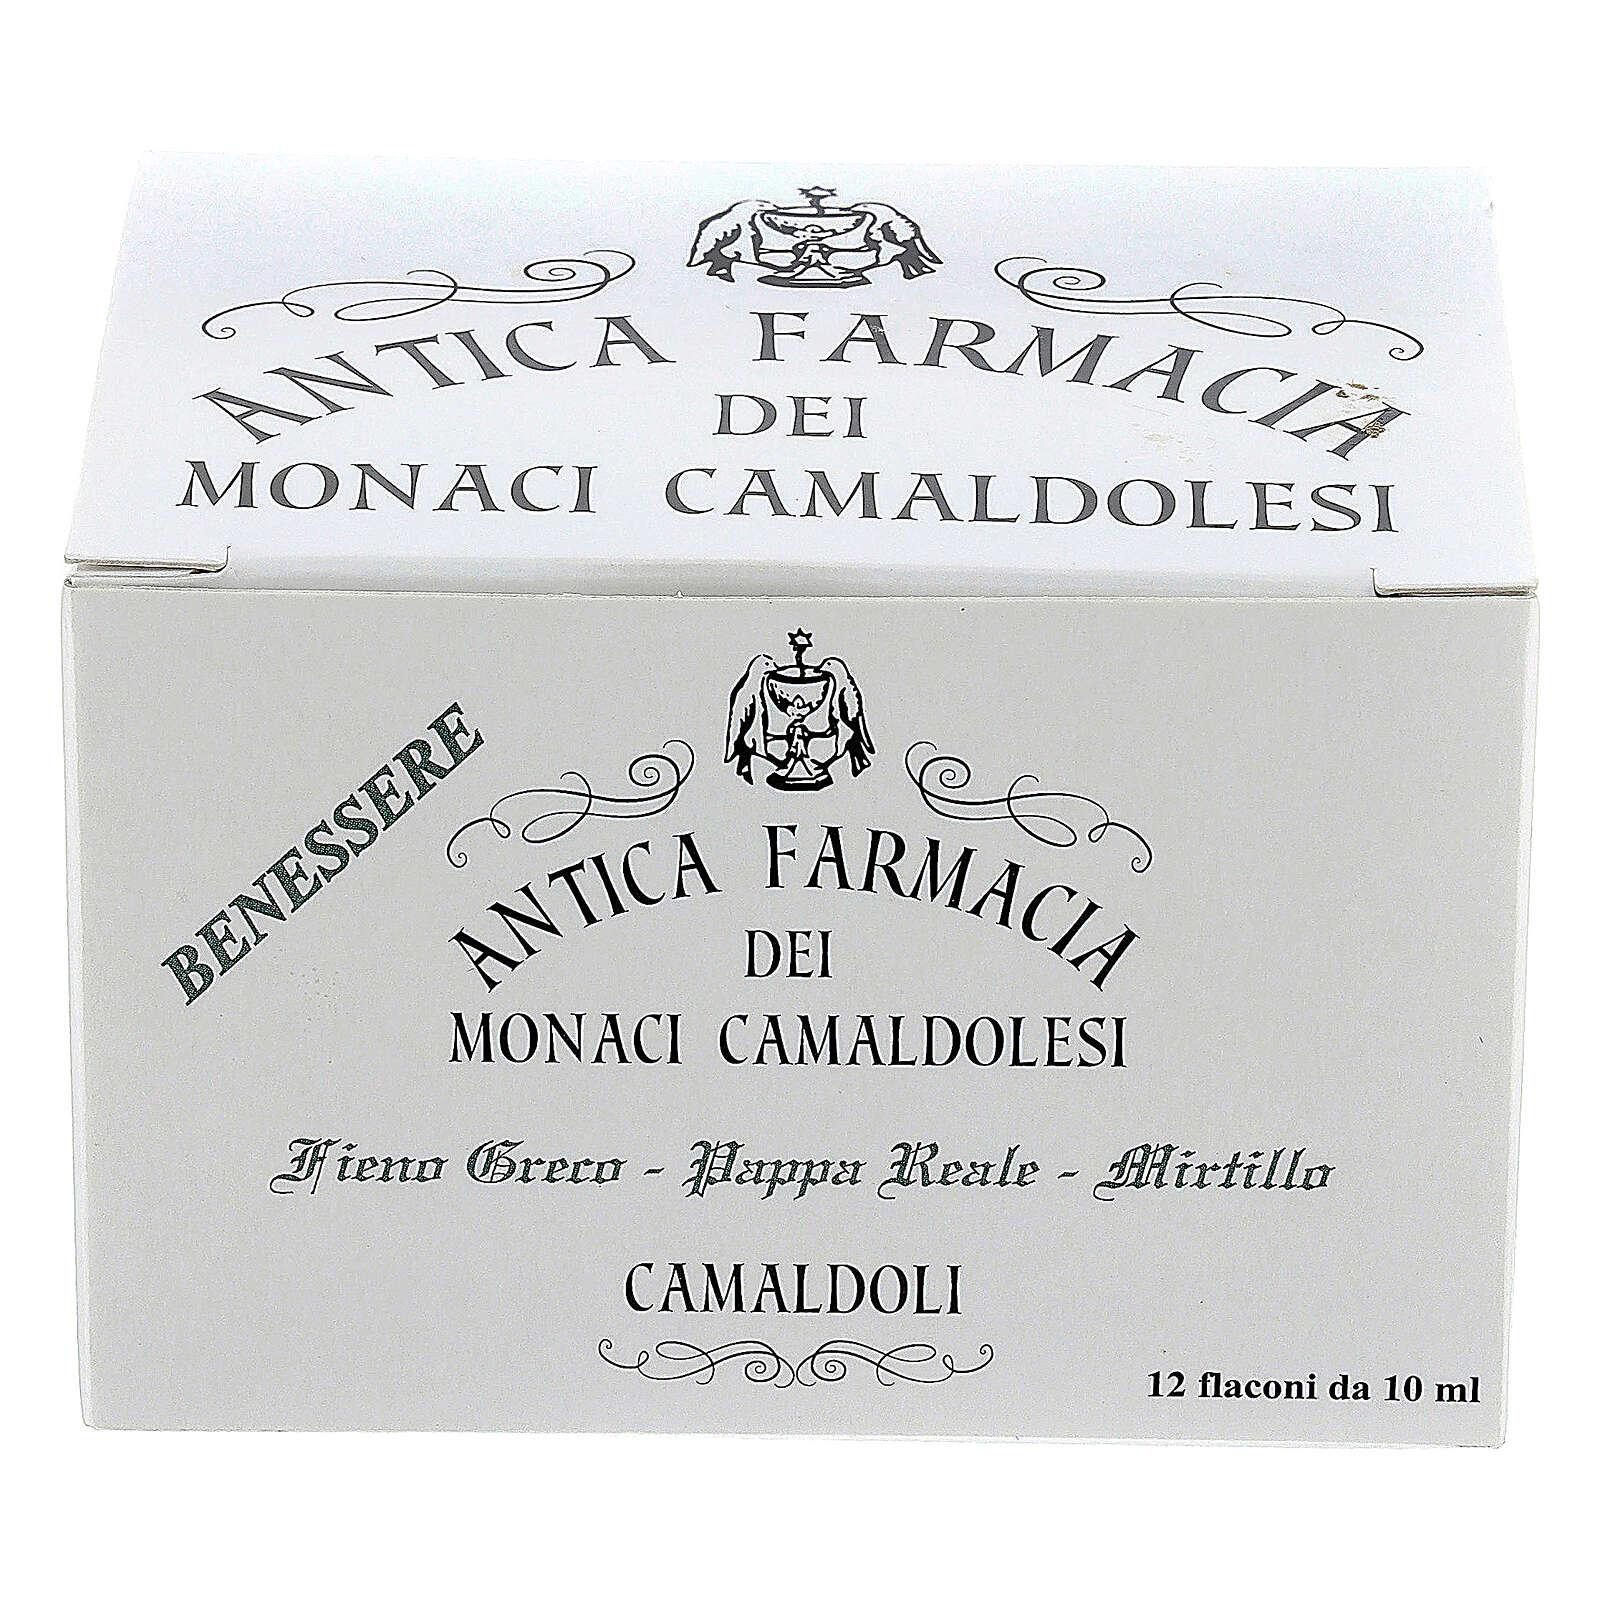 Reinvigorating drink blueberry, royal jelly, fenugreek - Camaldo 3